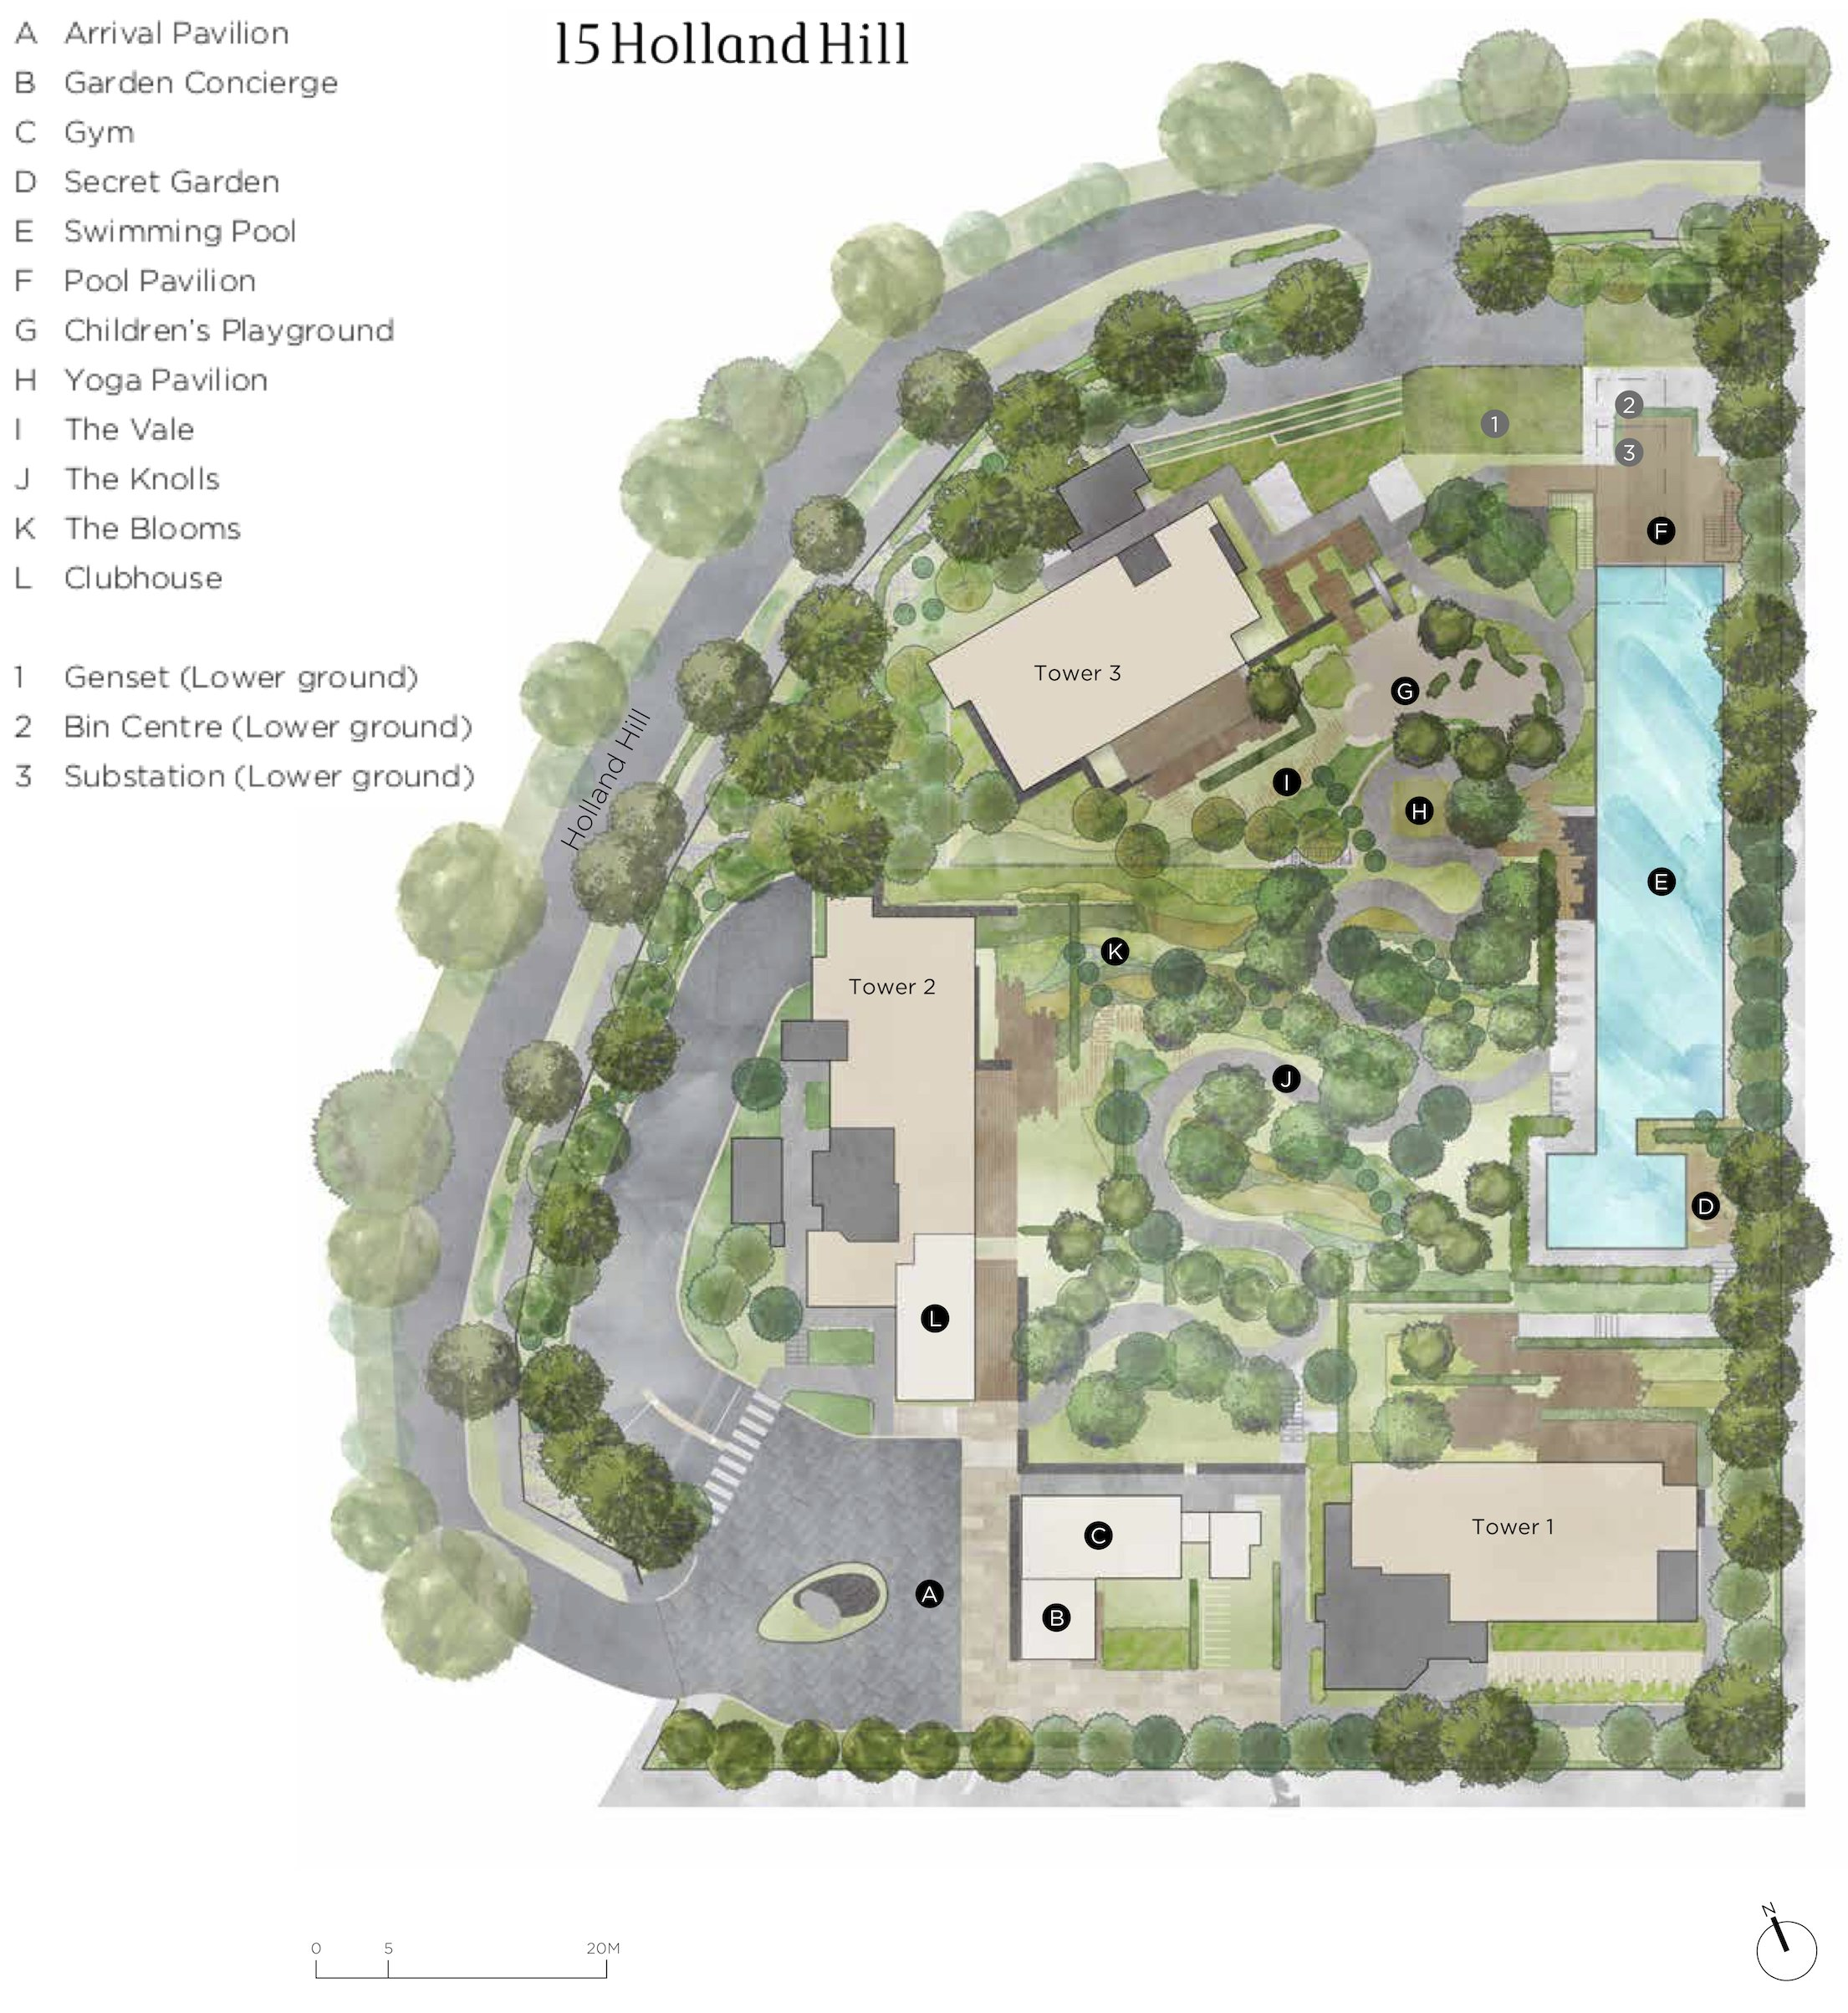 15 Holland Hill 荷兰山公寓 site plan